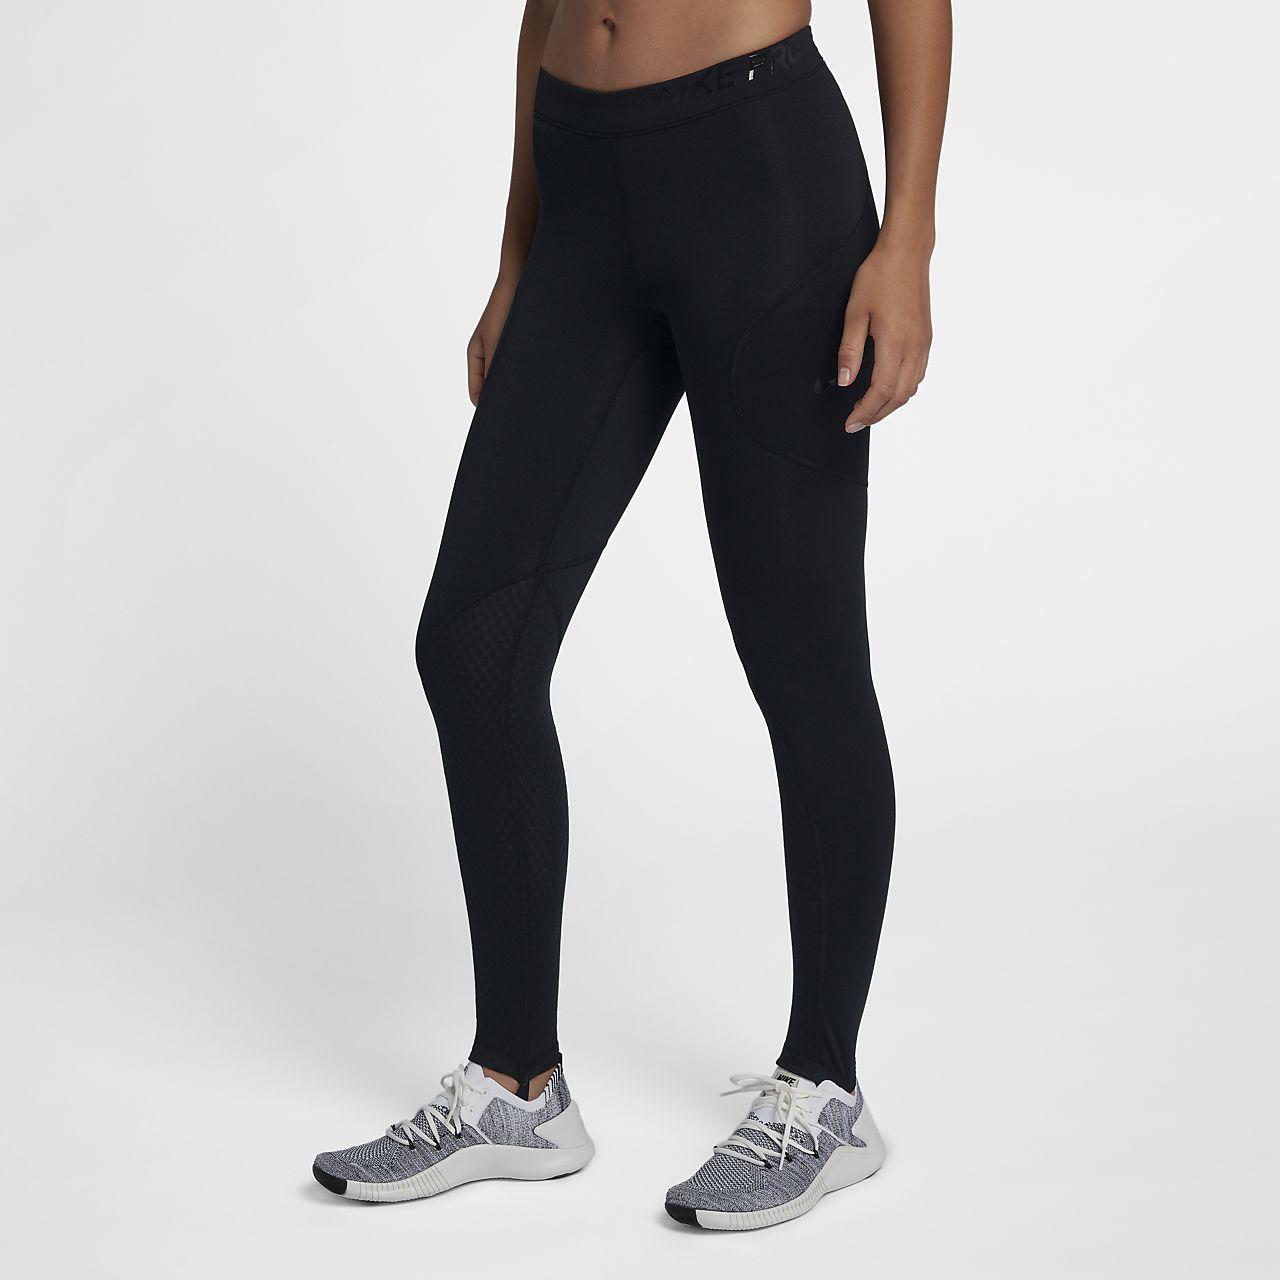 a7e19a0c7f39b Nike Pro HyperWarm Women's Tights. Nike.com BE